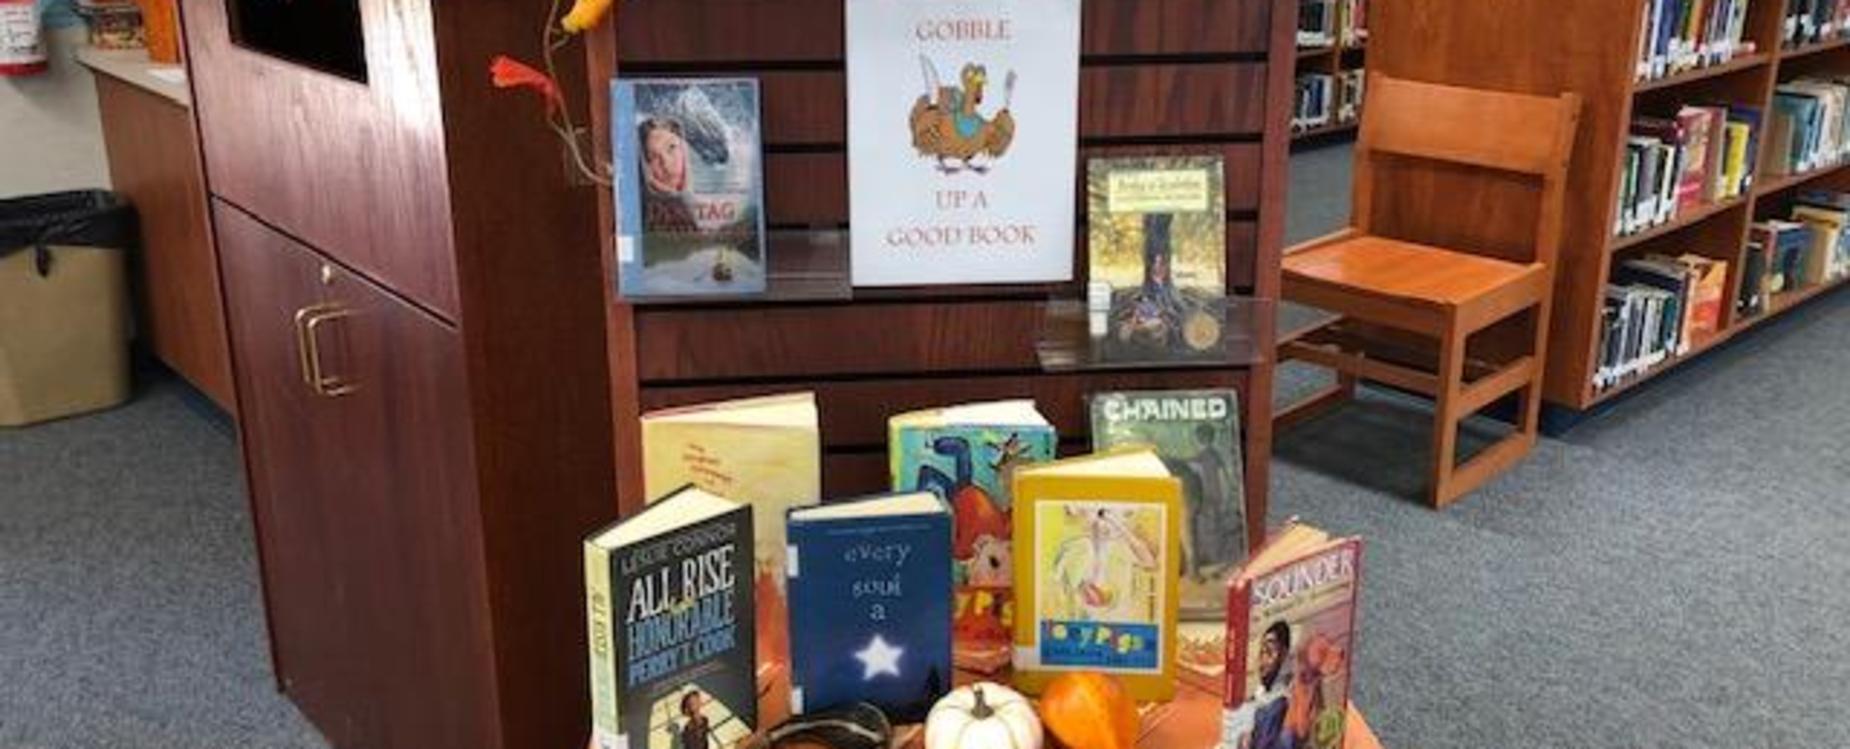 November Feast of Books